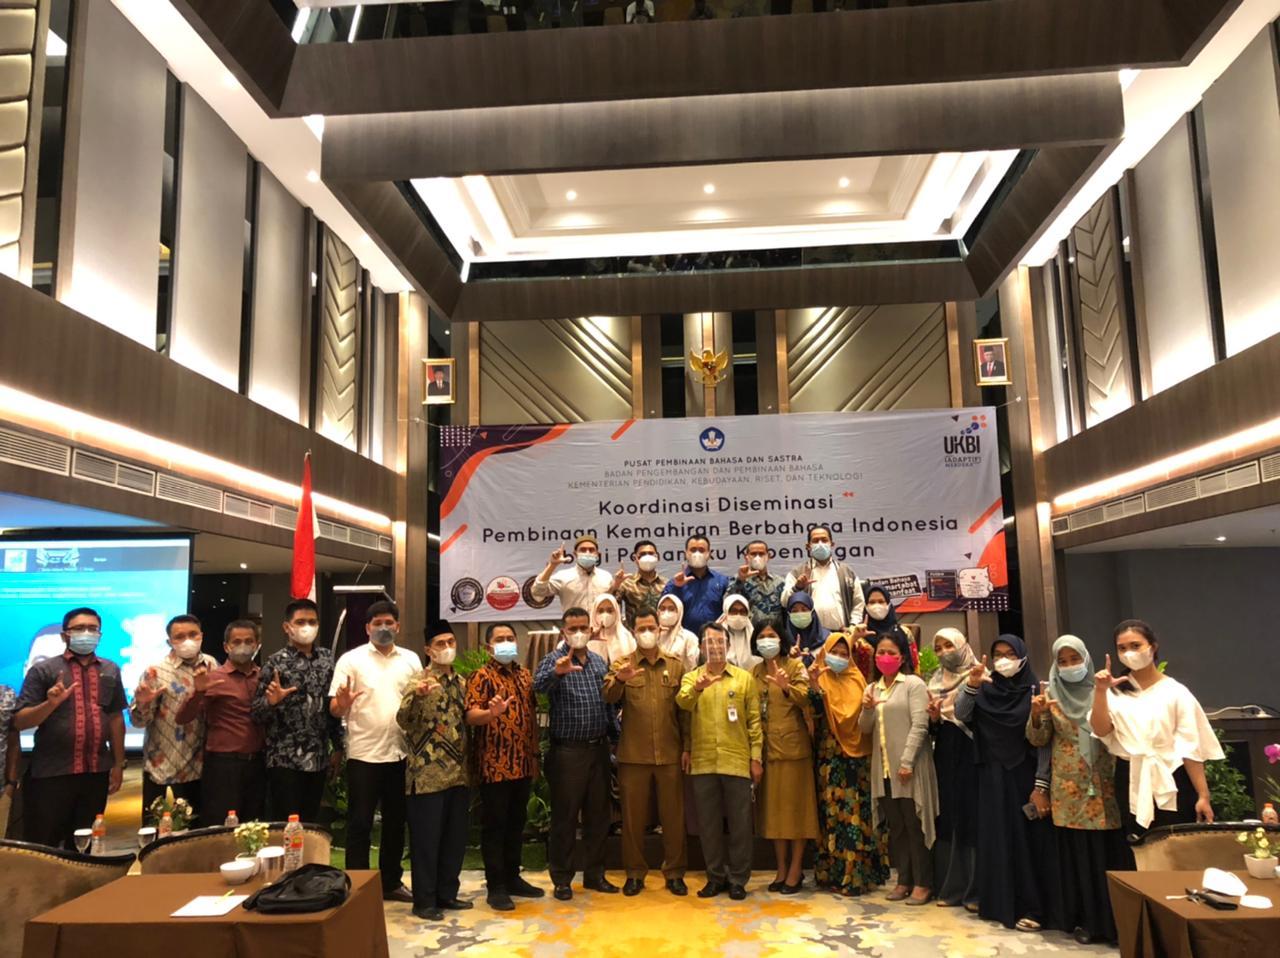 Koordinasi Diseminasi Pembinahan Kemahiran Berbahasa Indonesia Bagi Pemangku Kepentingan